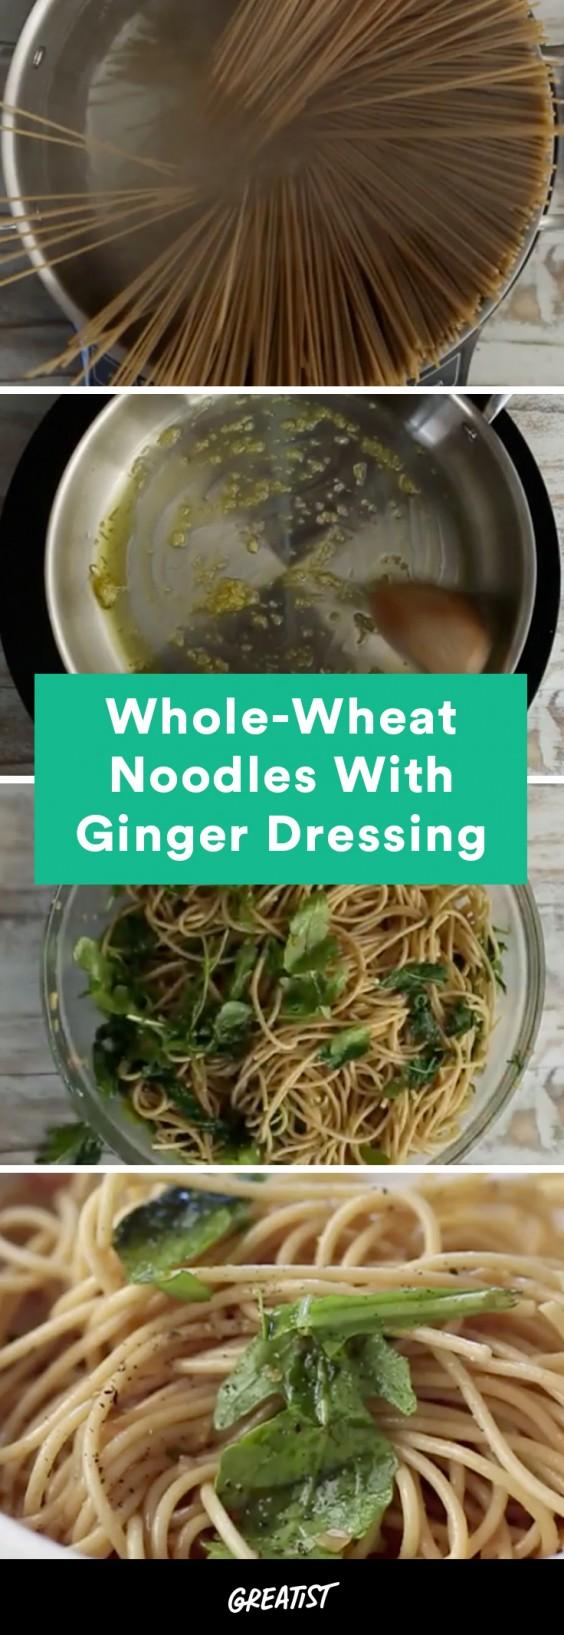 video: whole wheat noodles